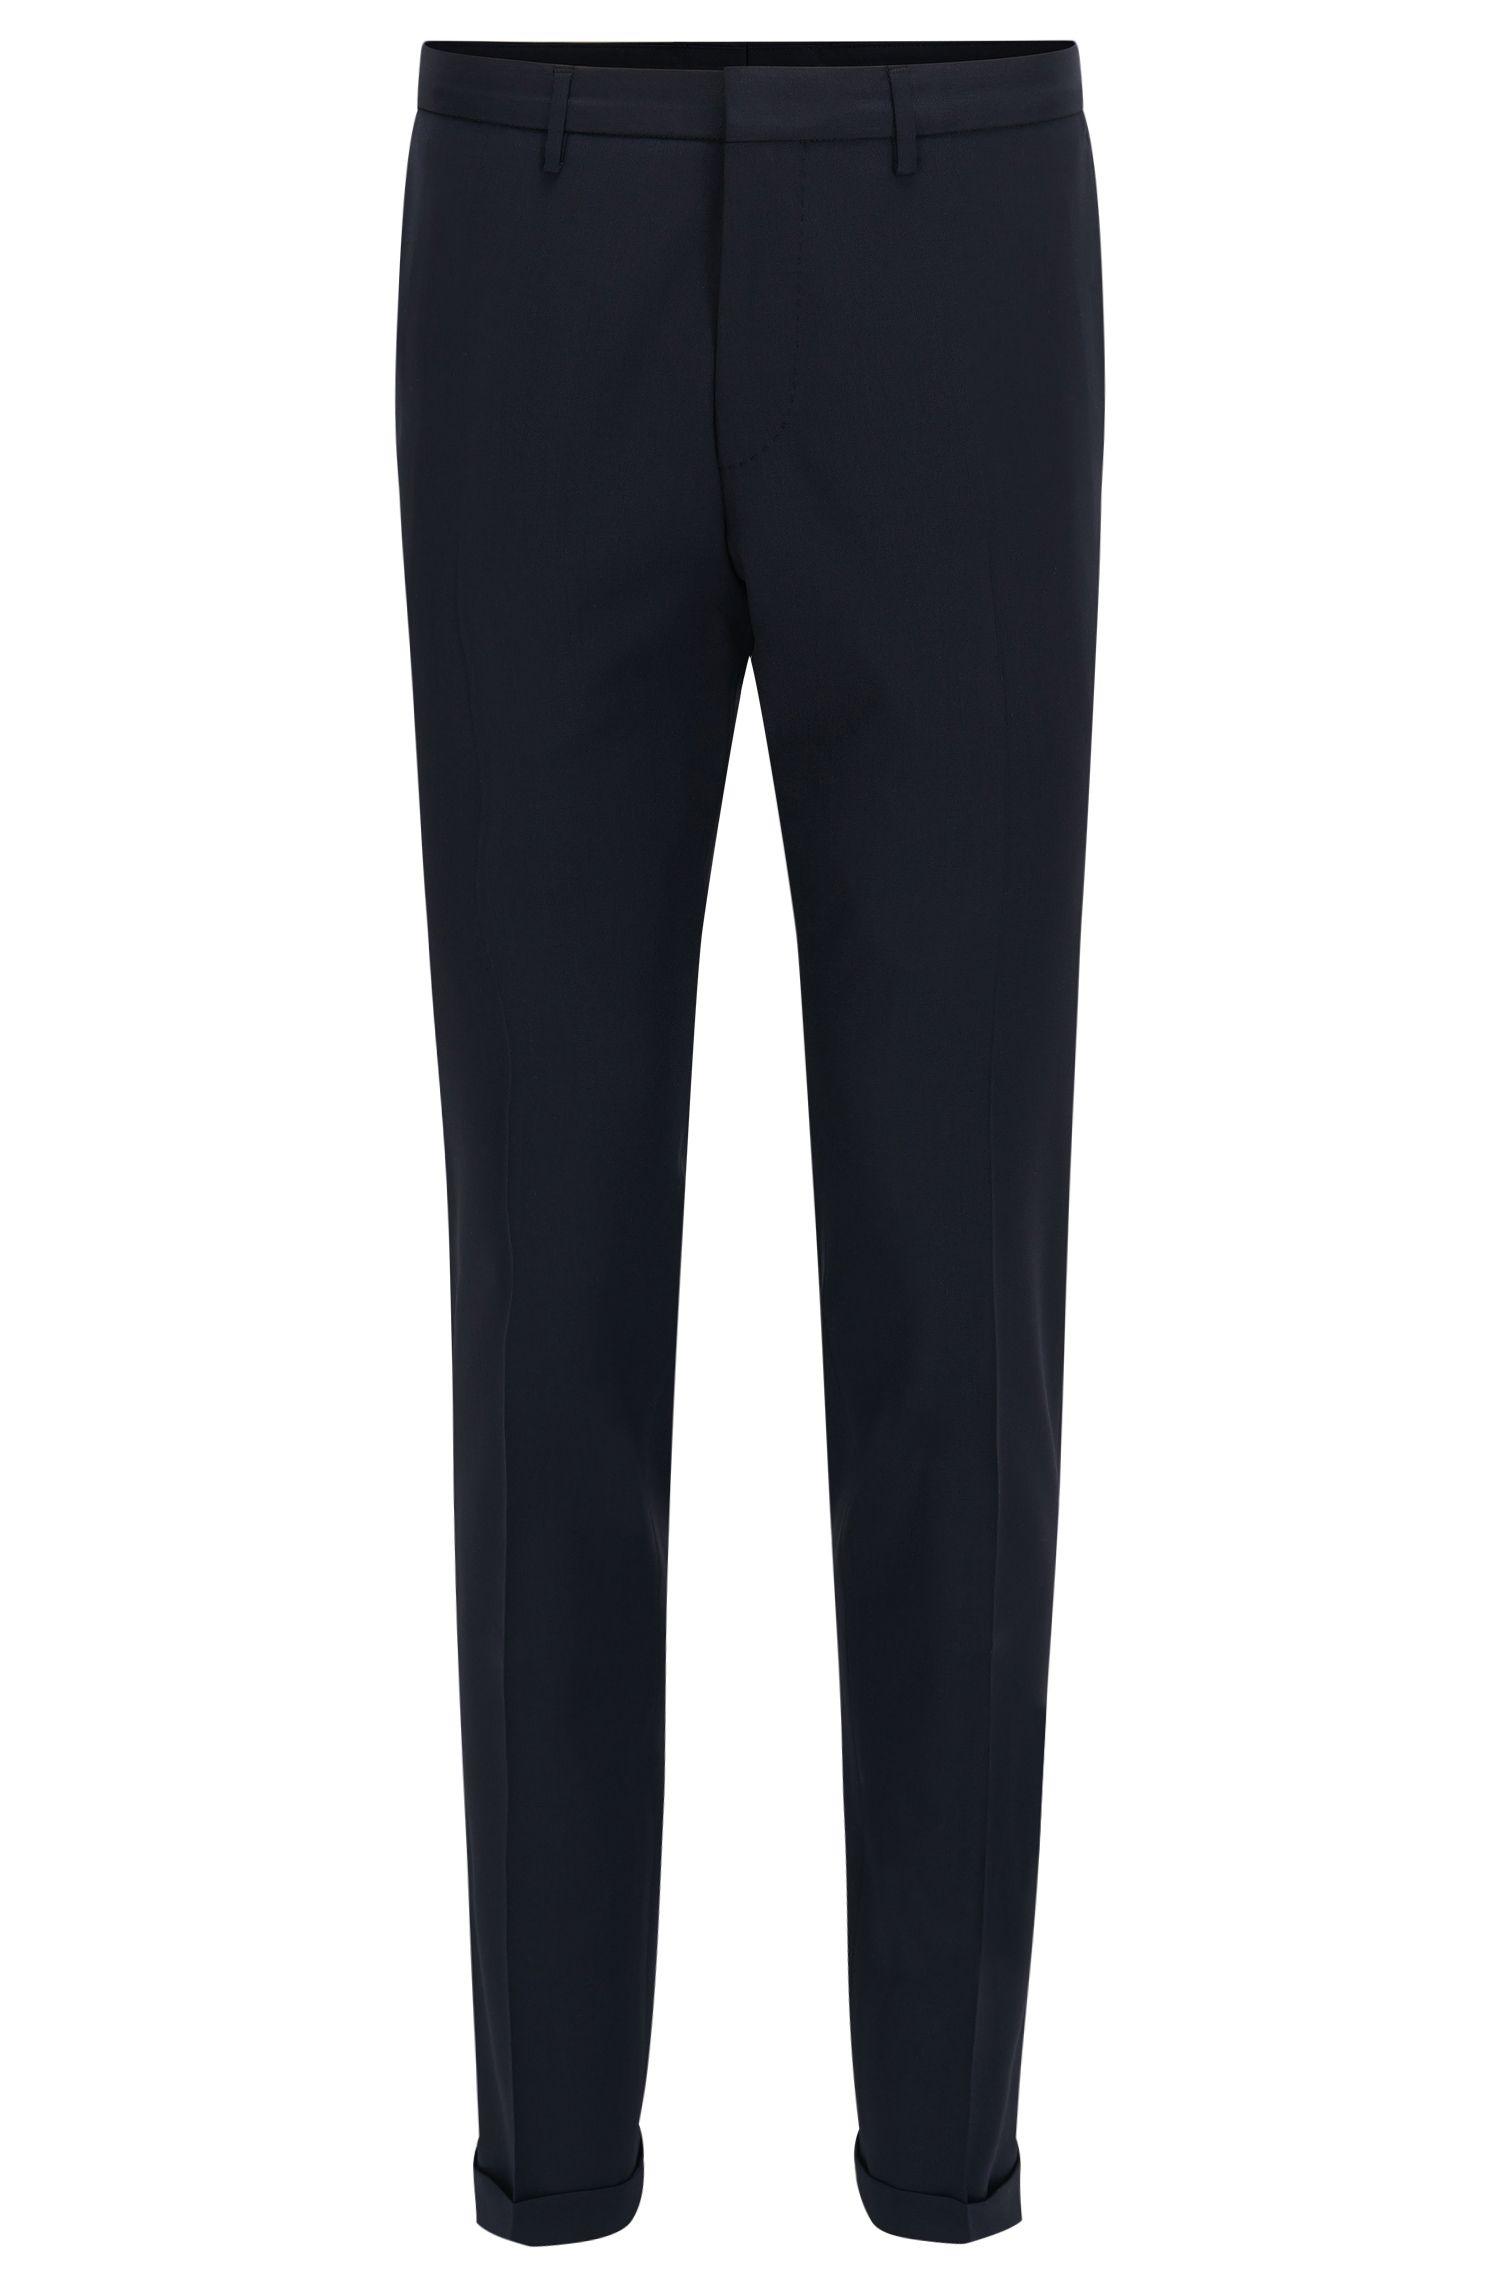 'Wave Cyl' | Extra Slim Fit, Virgin Wool Dress Pants